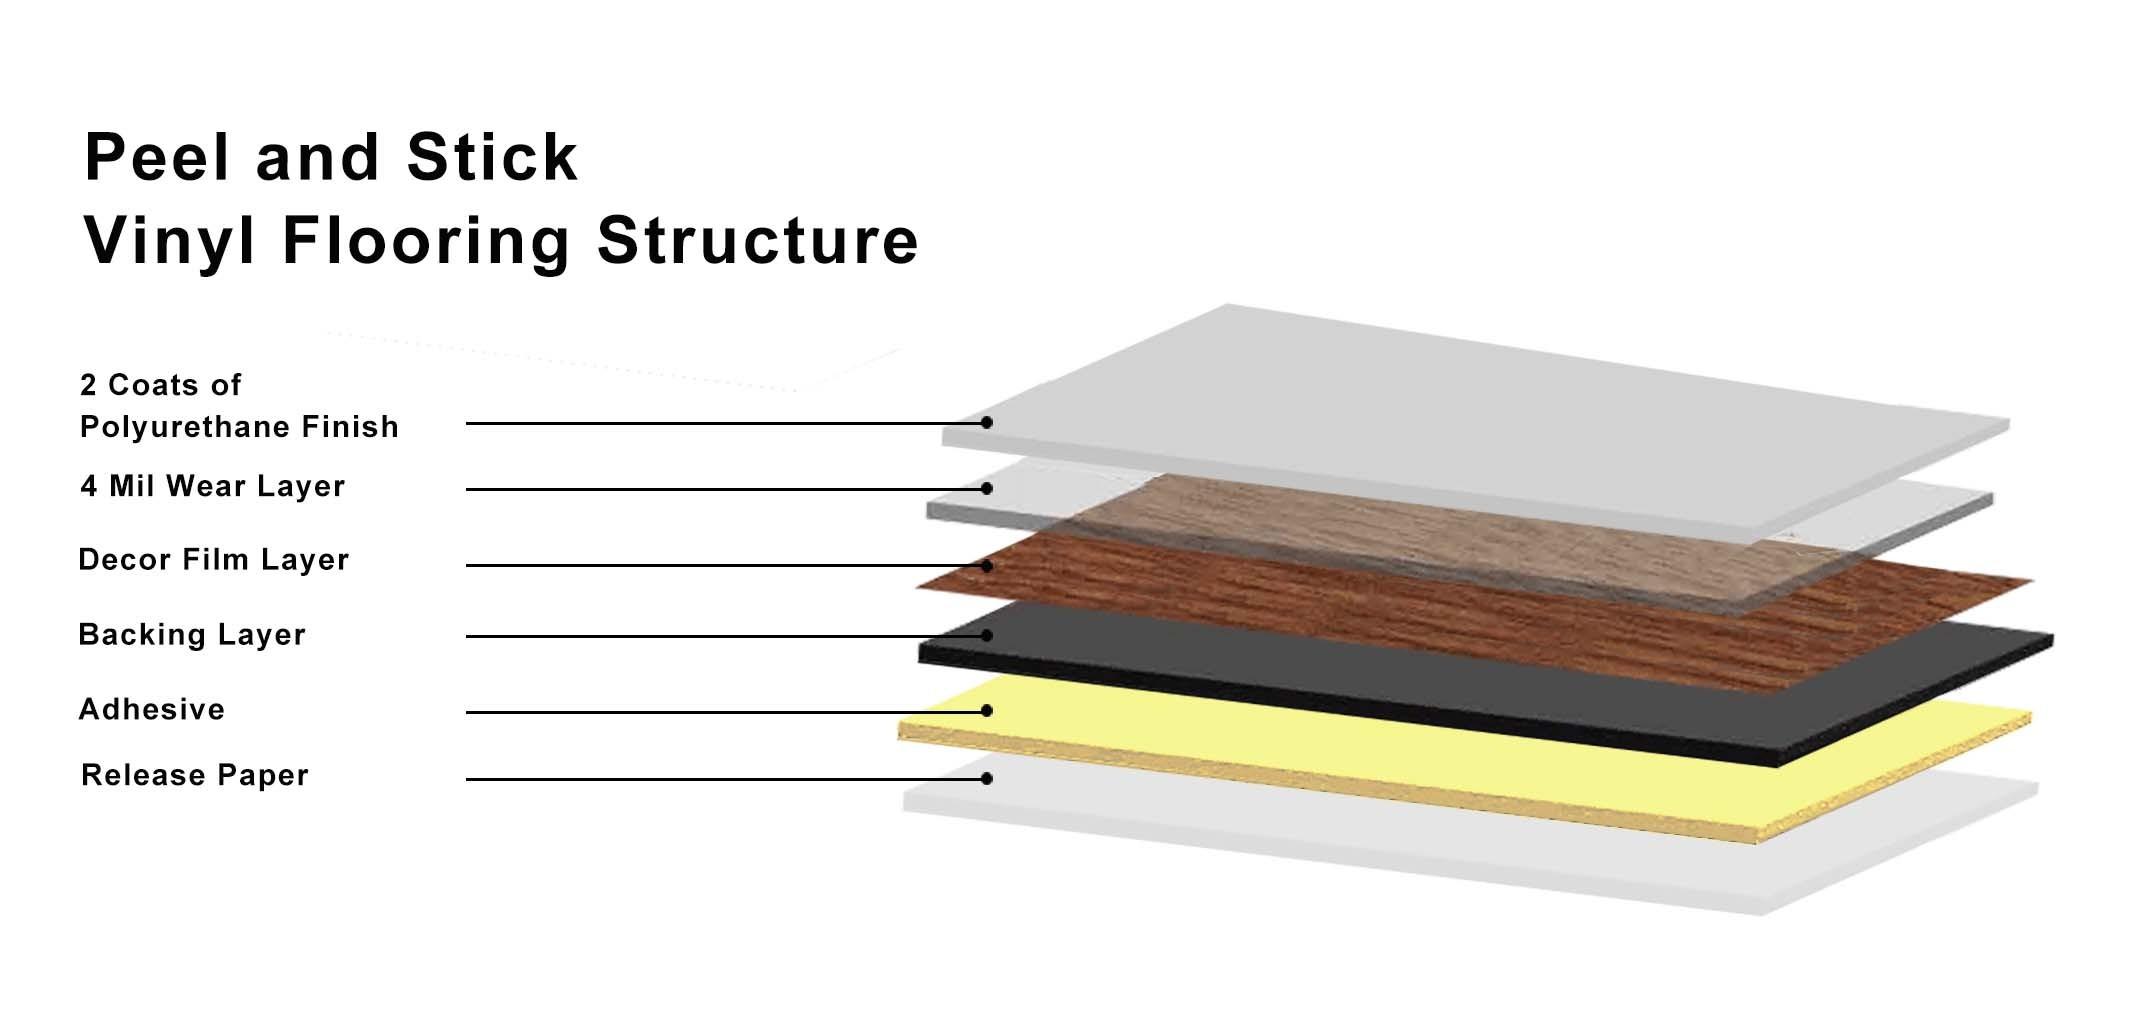 Peel and Stick Vinyl Flooring Structure